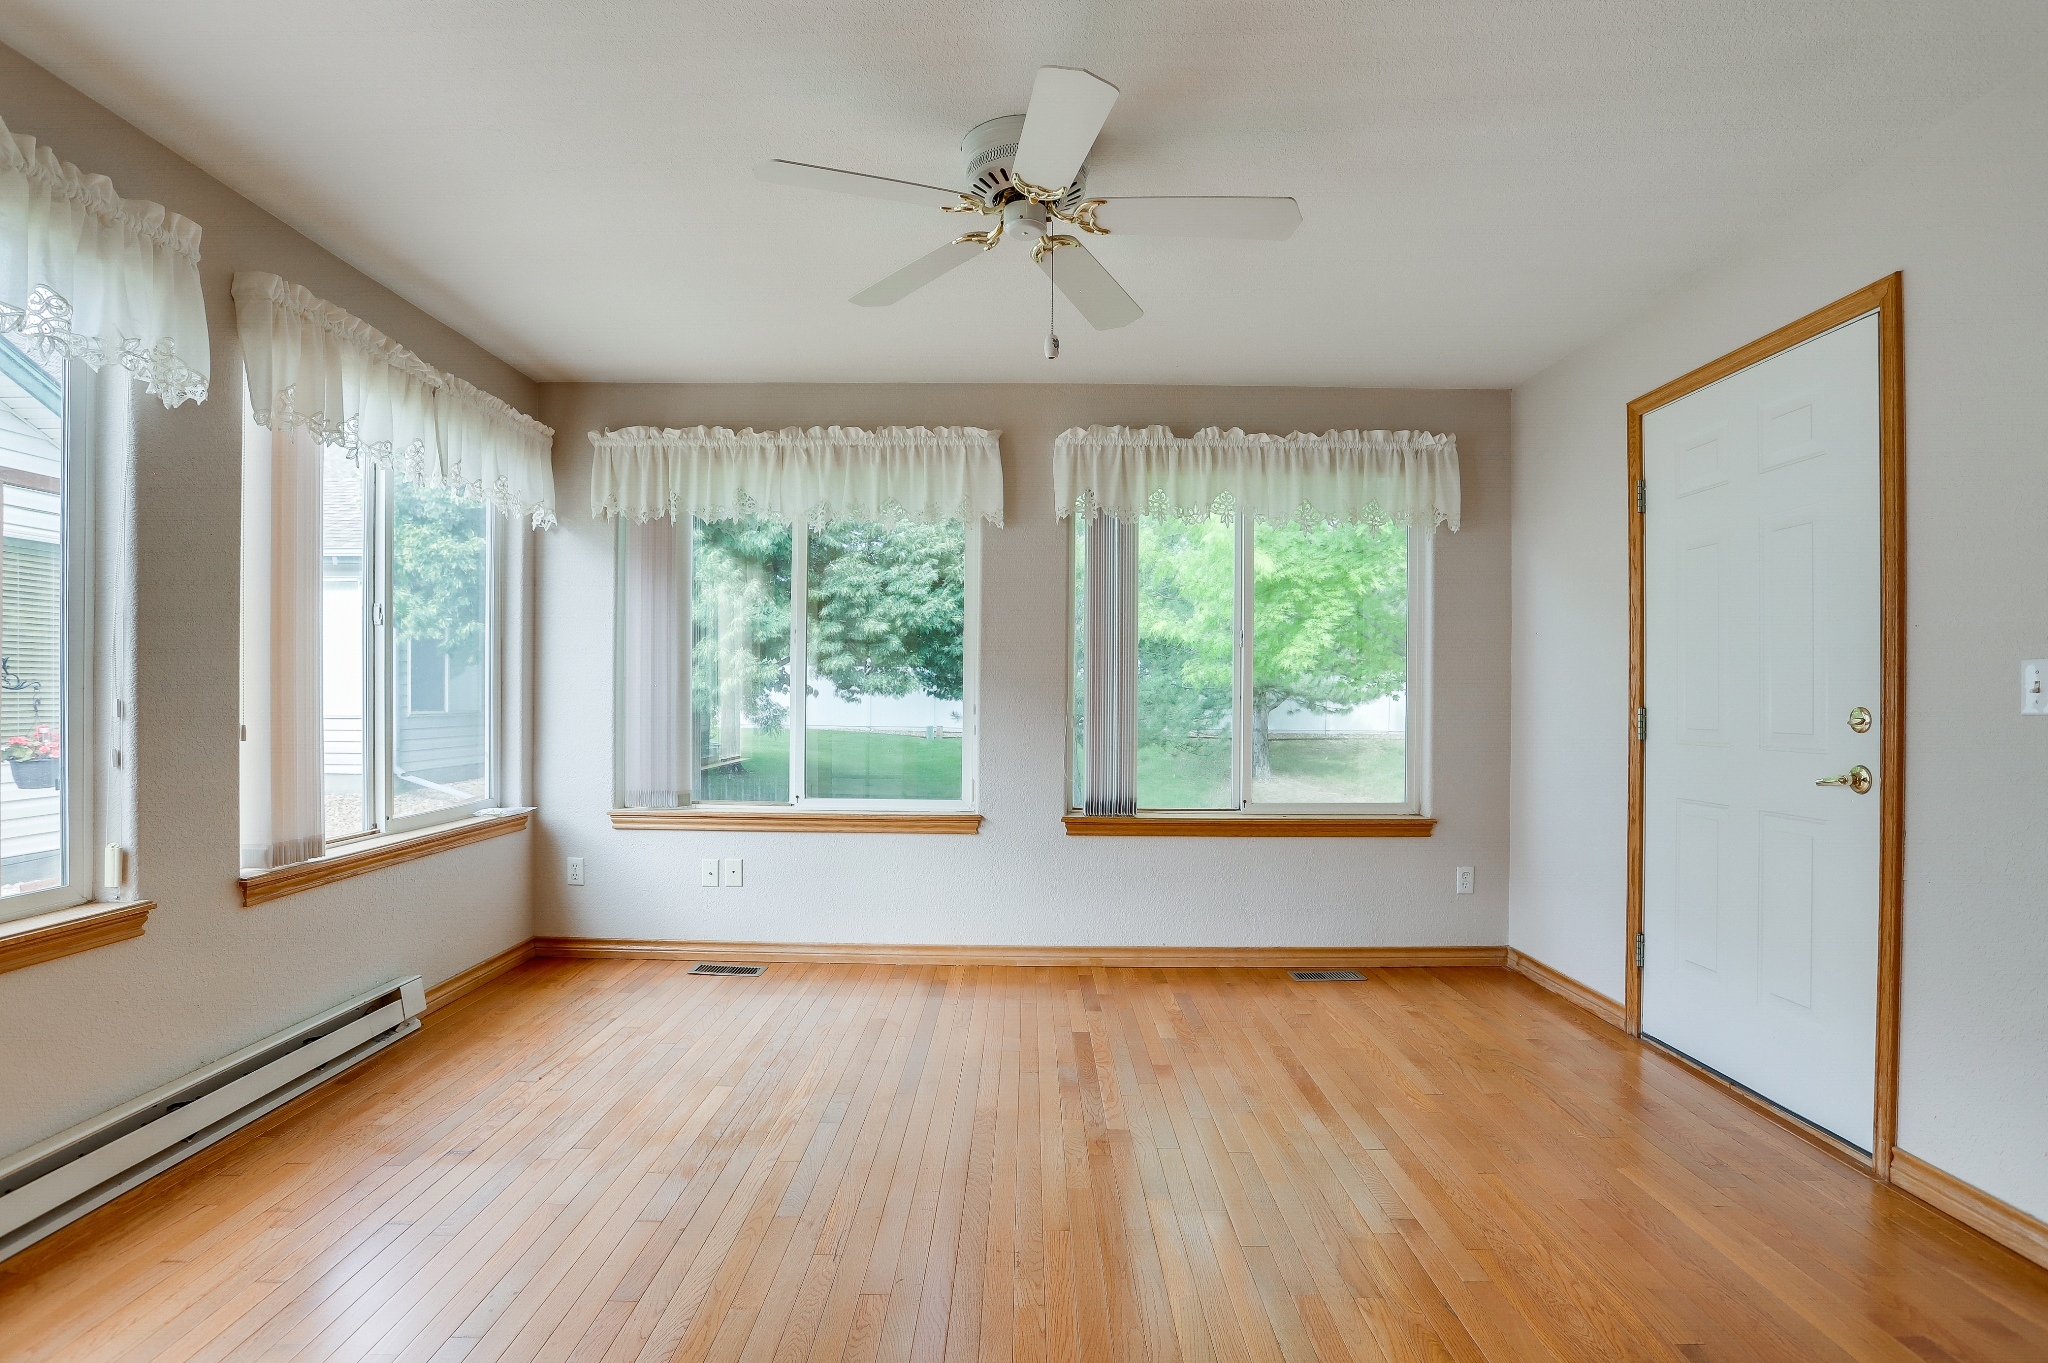 REAL ESTATE LISTING: 1730 Grove Ct Longmont Sun Room